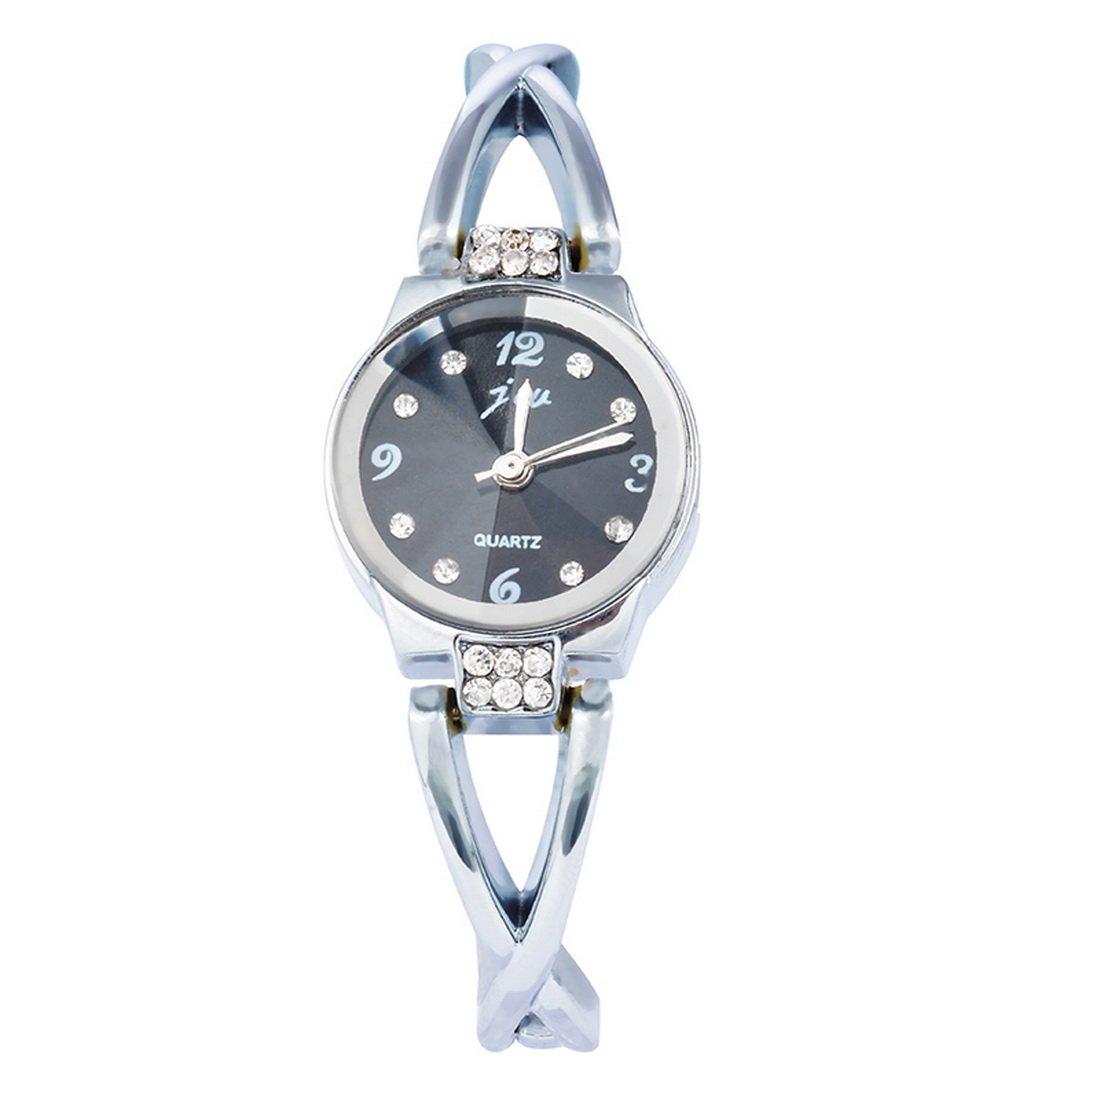 RainBabe Black Hollow Sunflower Dial White Silcon Analog Quartz Wrist Watch 25cm for Women